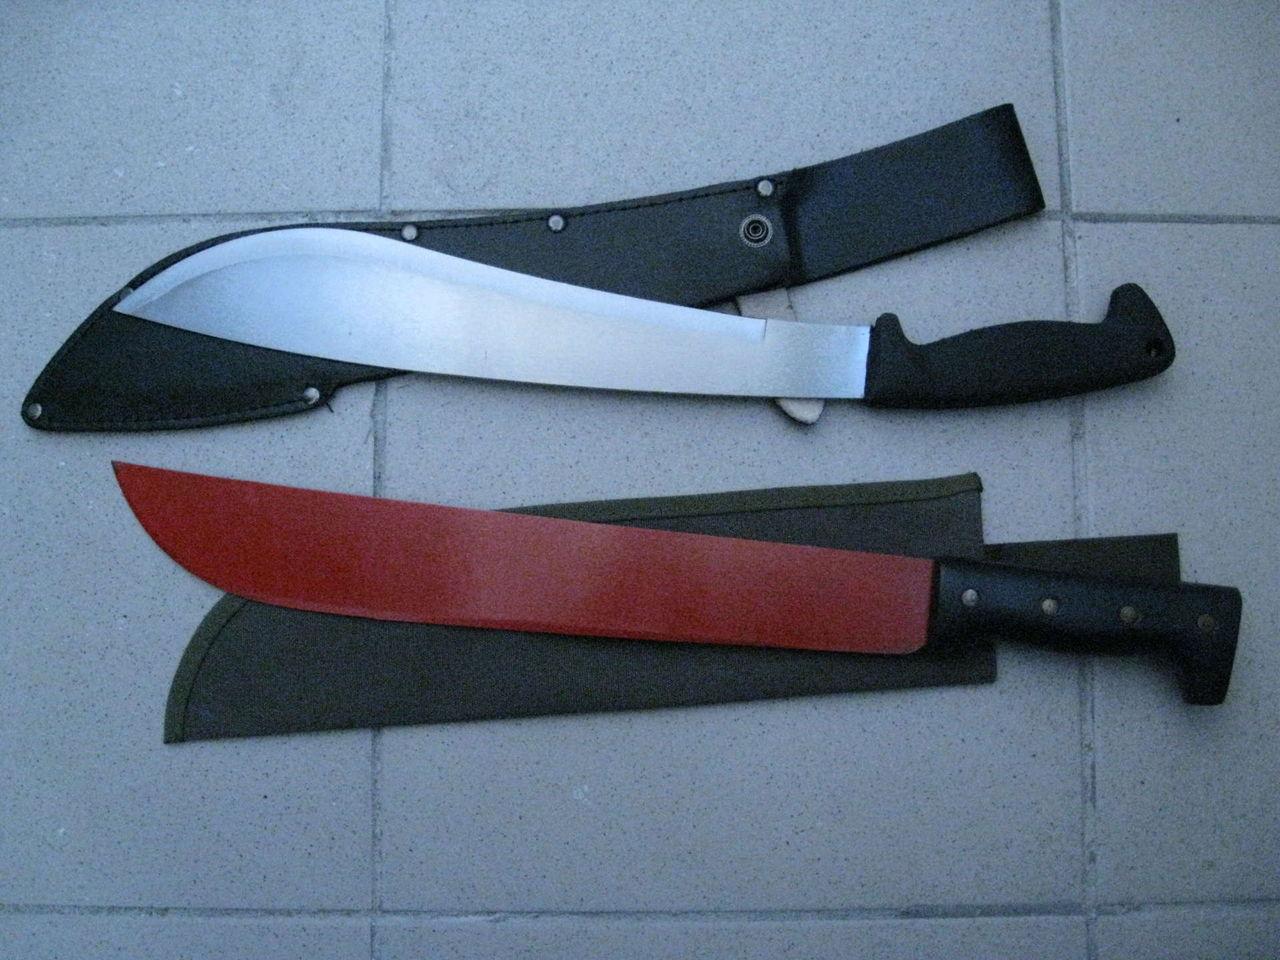 Ножны для мачете из пластика